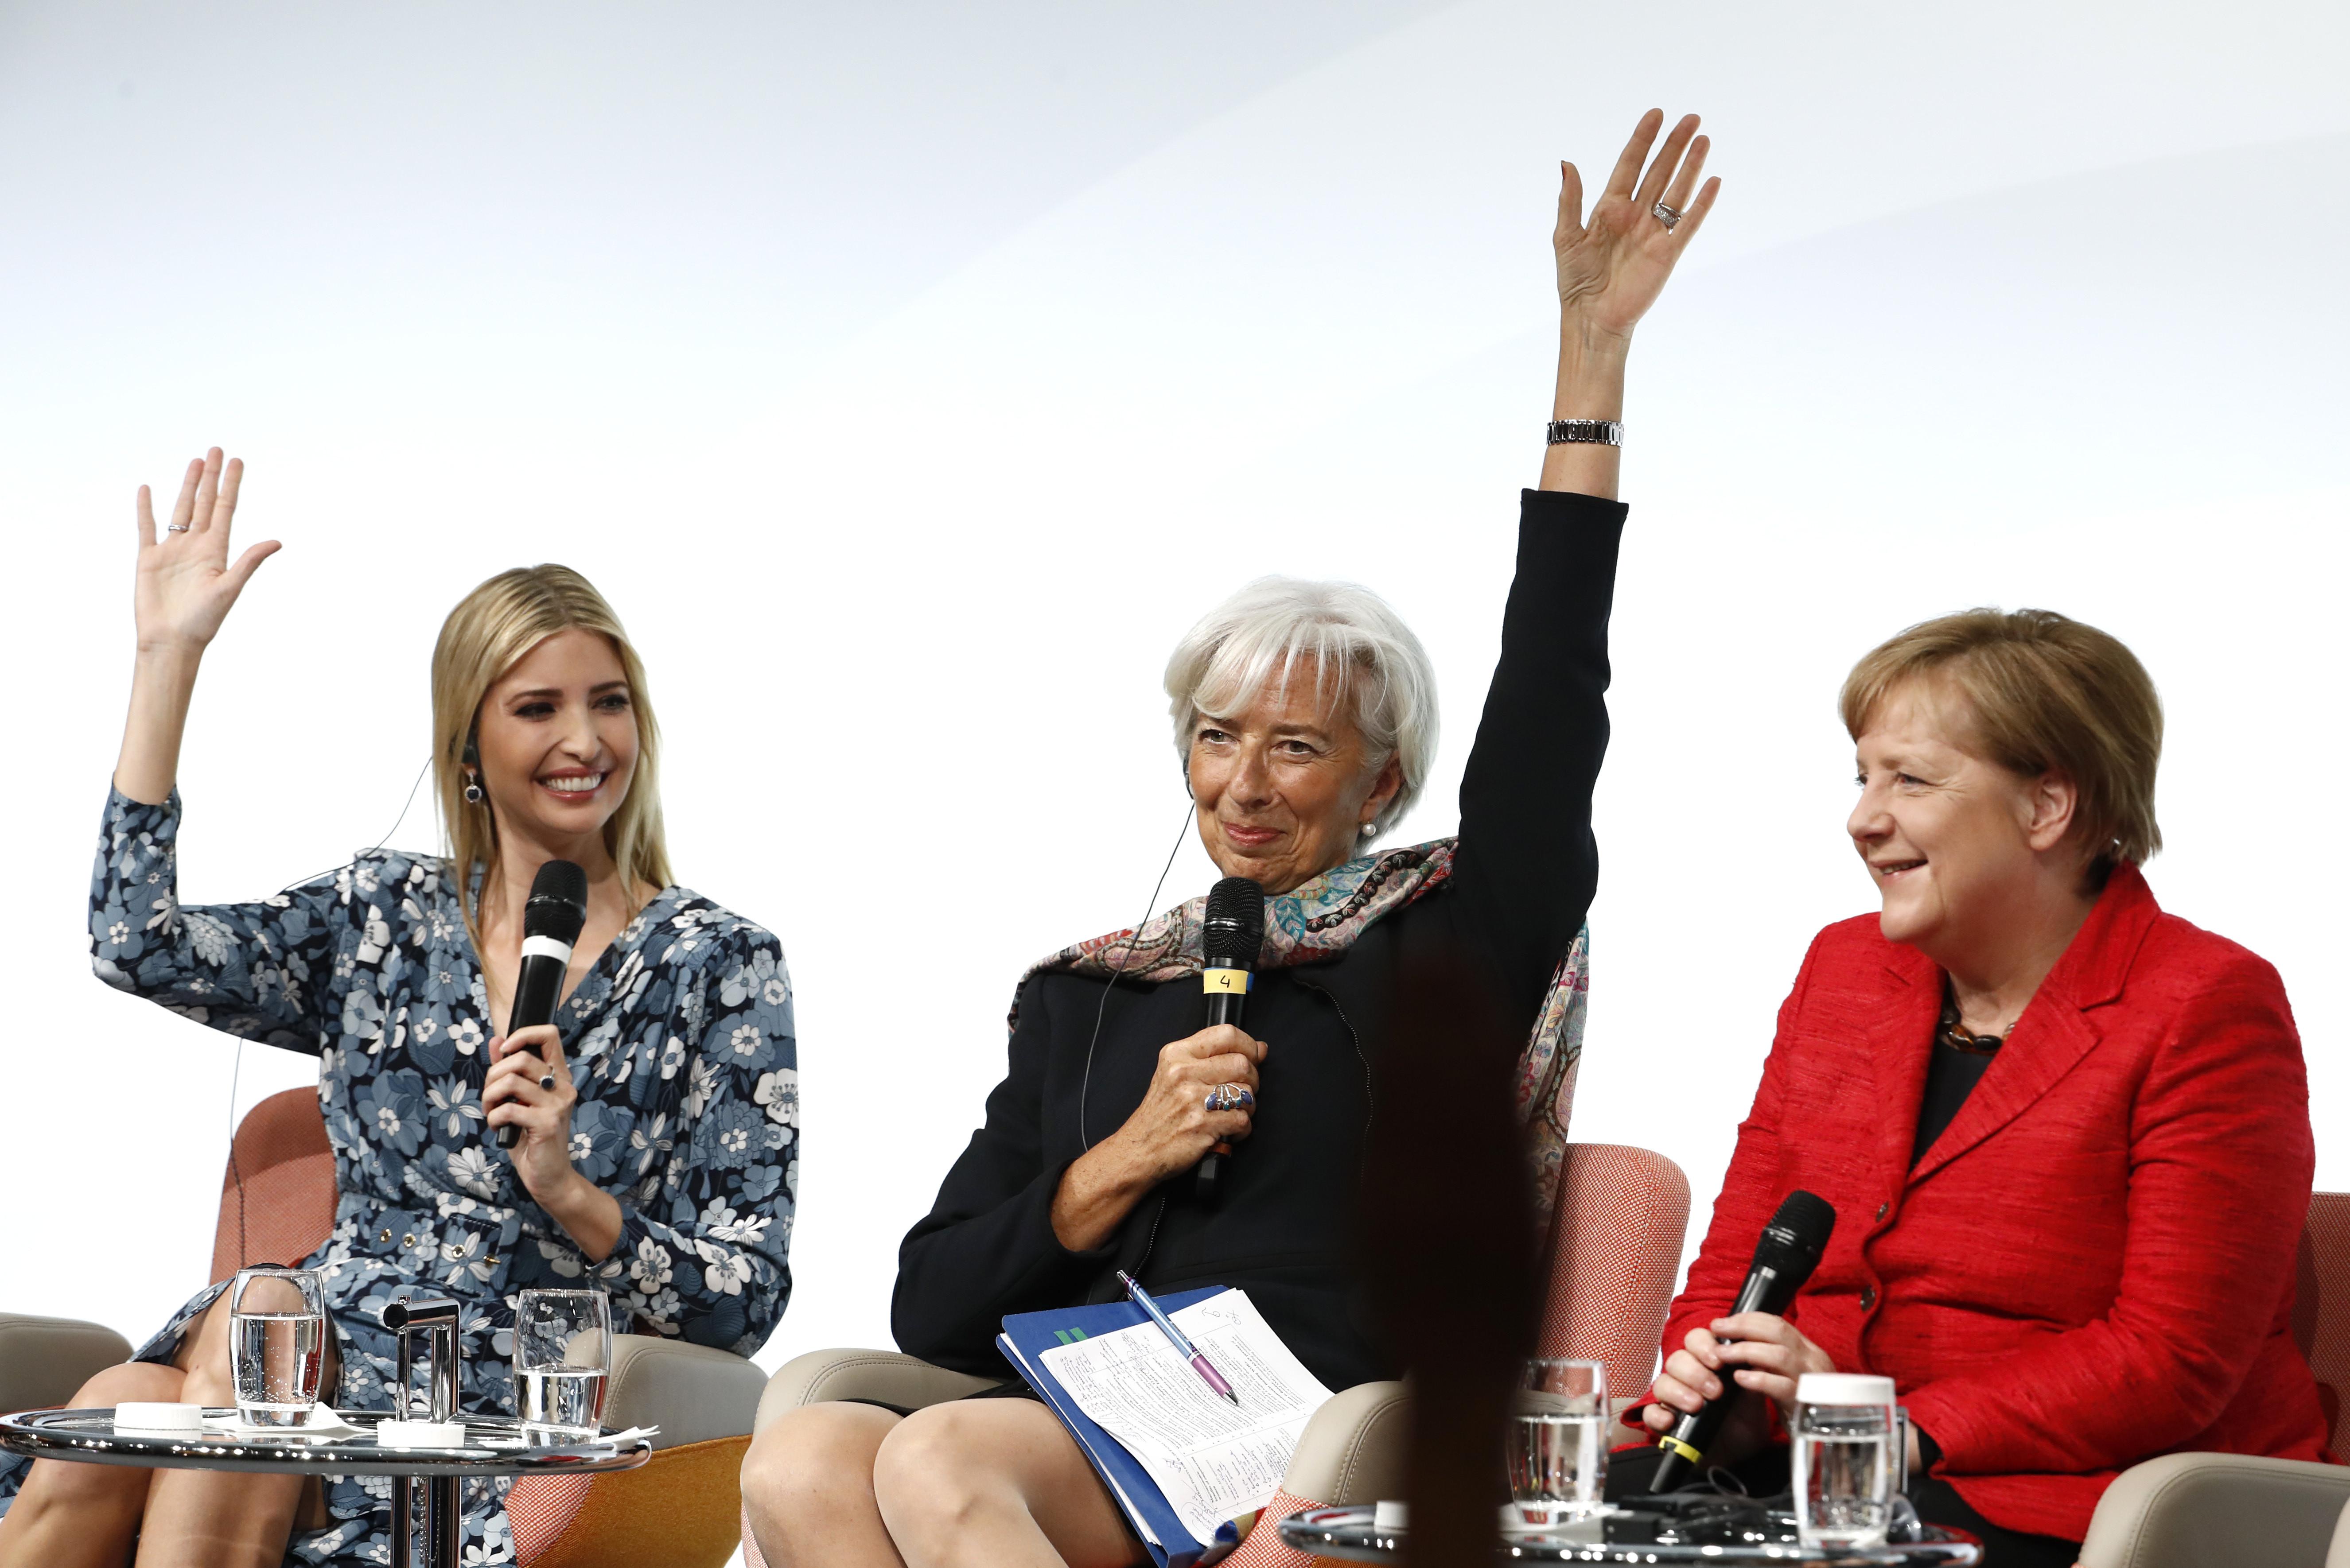 merkel women 20 summit